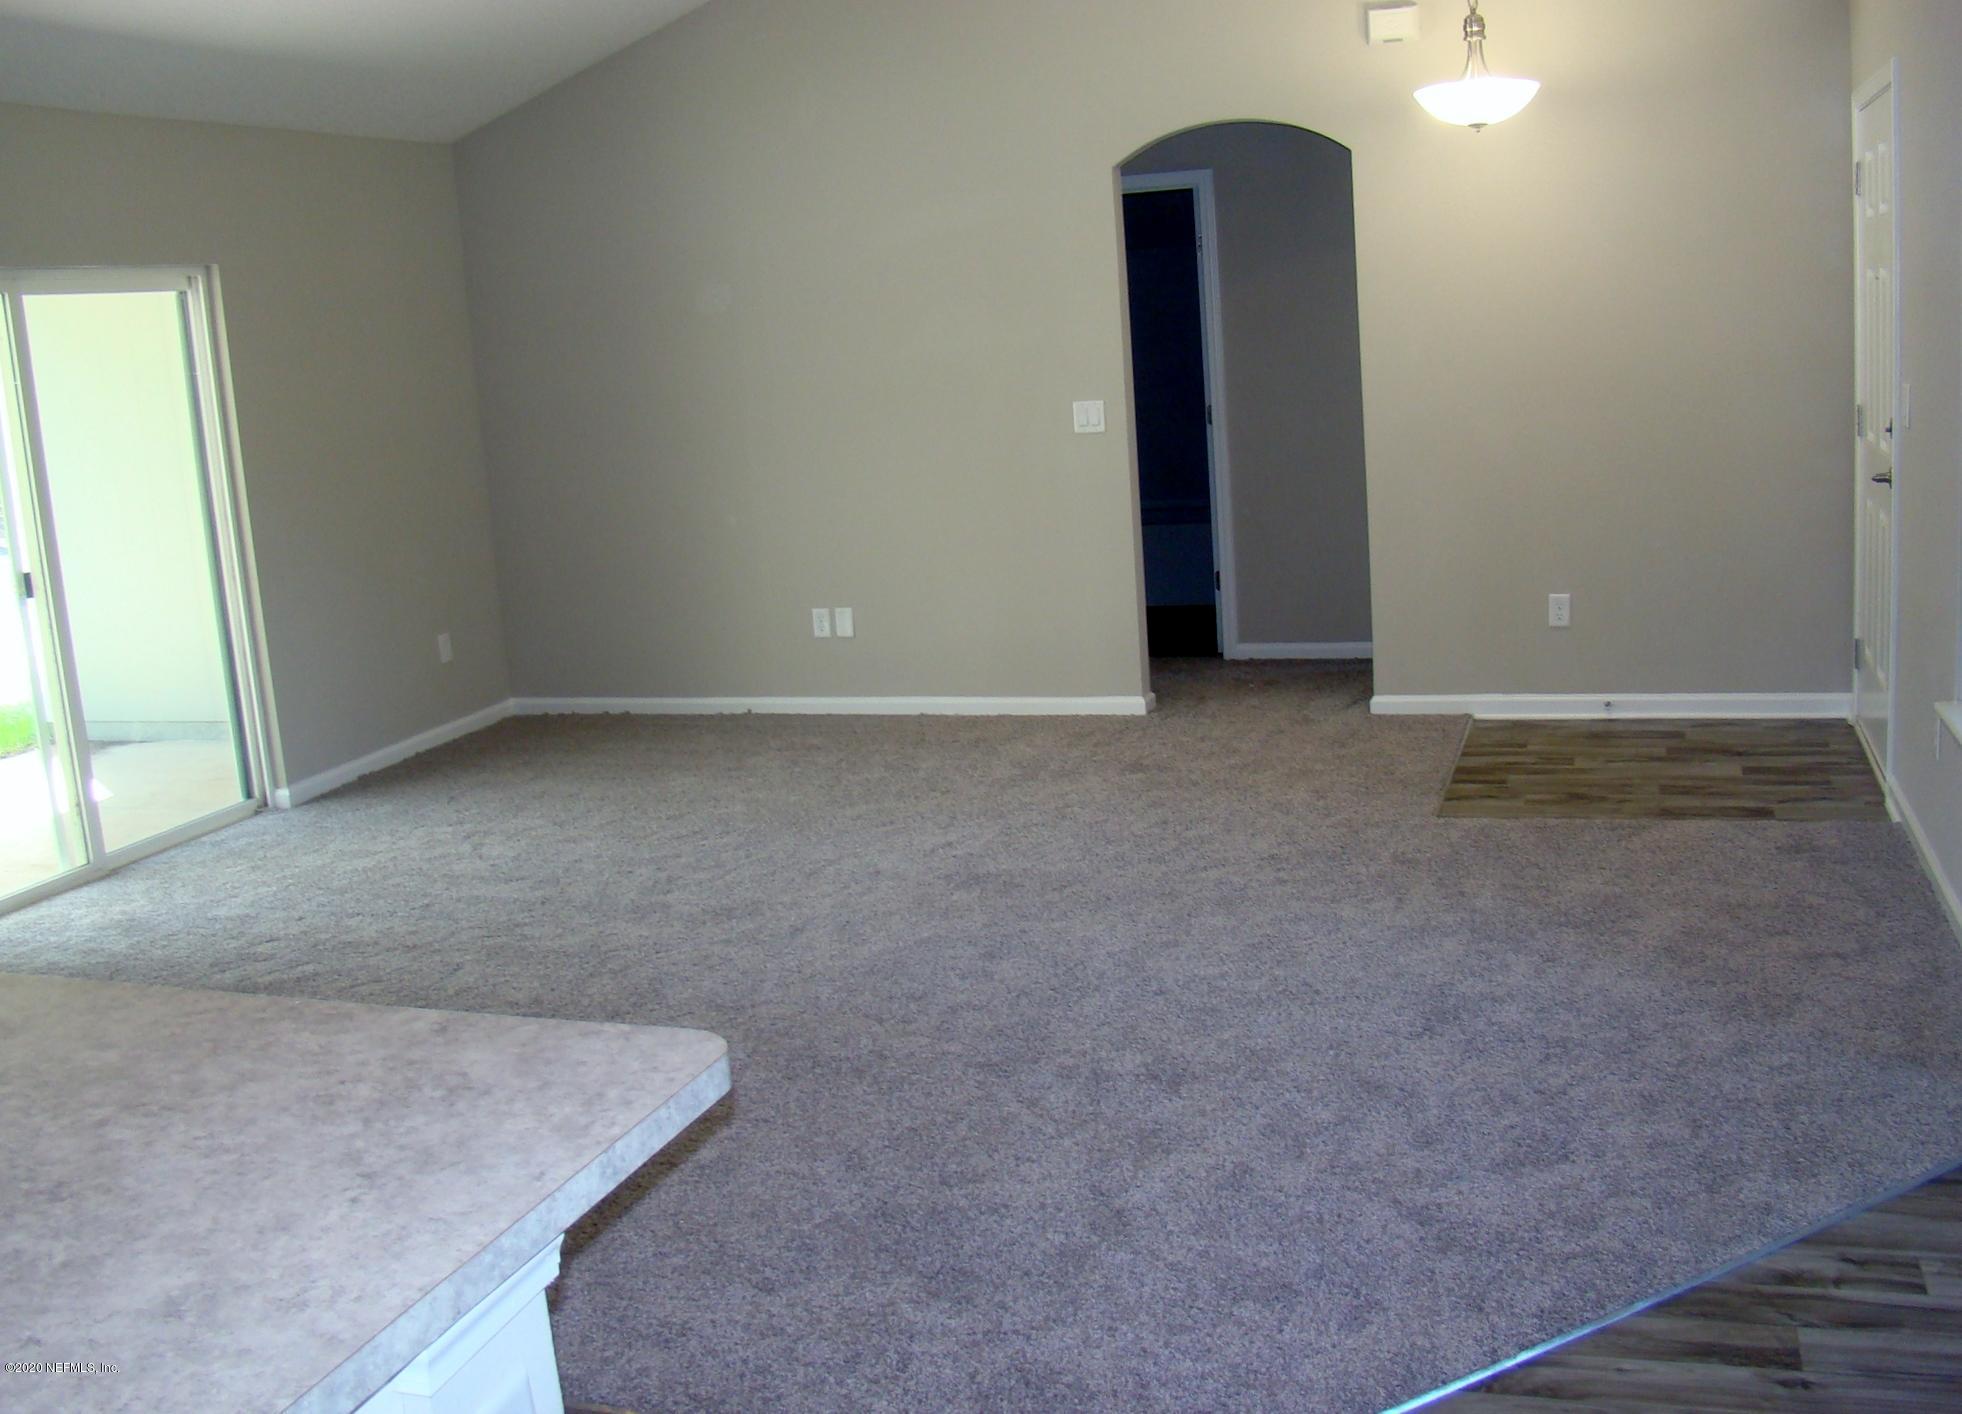 4933 CALENDULA, MIDDLEBURG, FLORIDA 32068, 3 Bedrooms Bedrooms, ,2 BathroomsBathrooms,Residential,For sale,CALENDULA,1054814